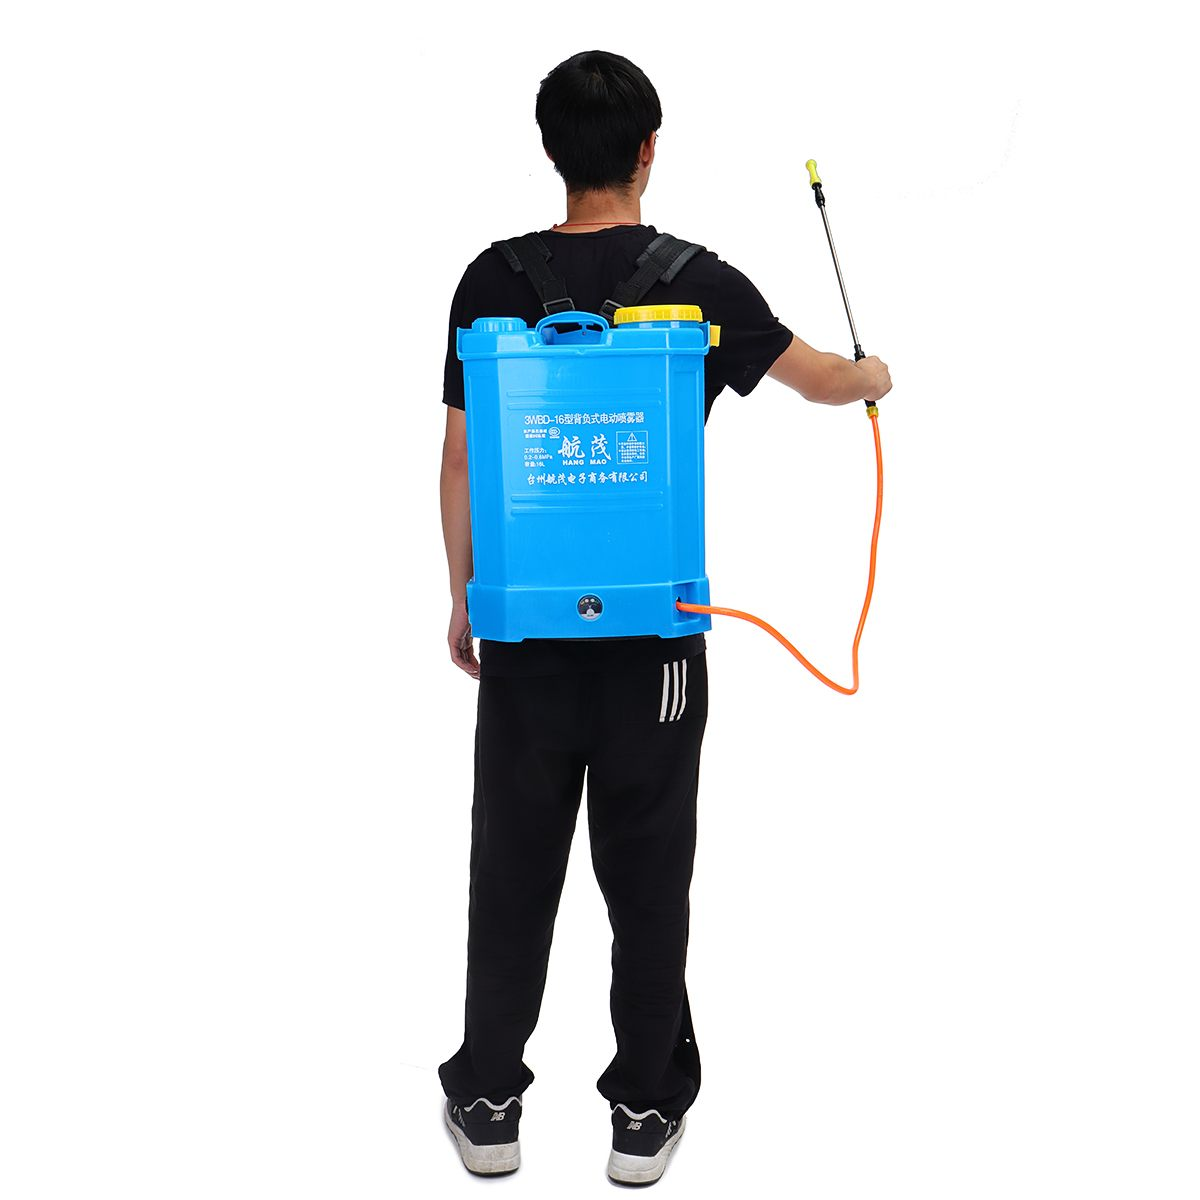 Agricultural Pesticide Spray Equipment Backpack Garden Intelligent Sprayer Knapsack 16 Litre 12v 240v Battery Cordless